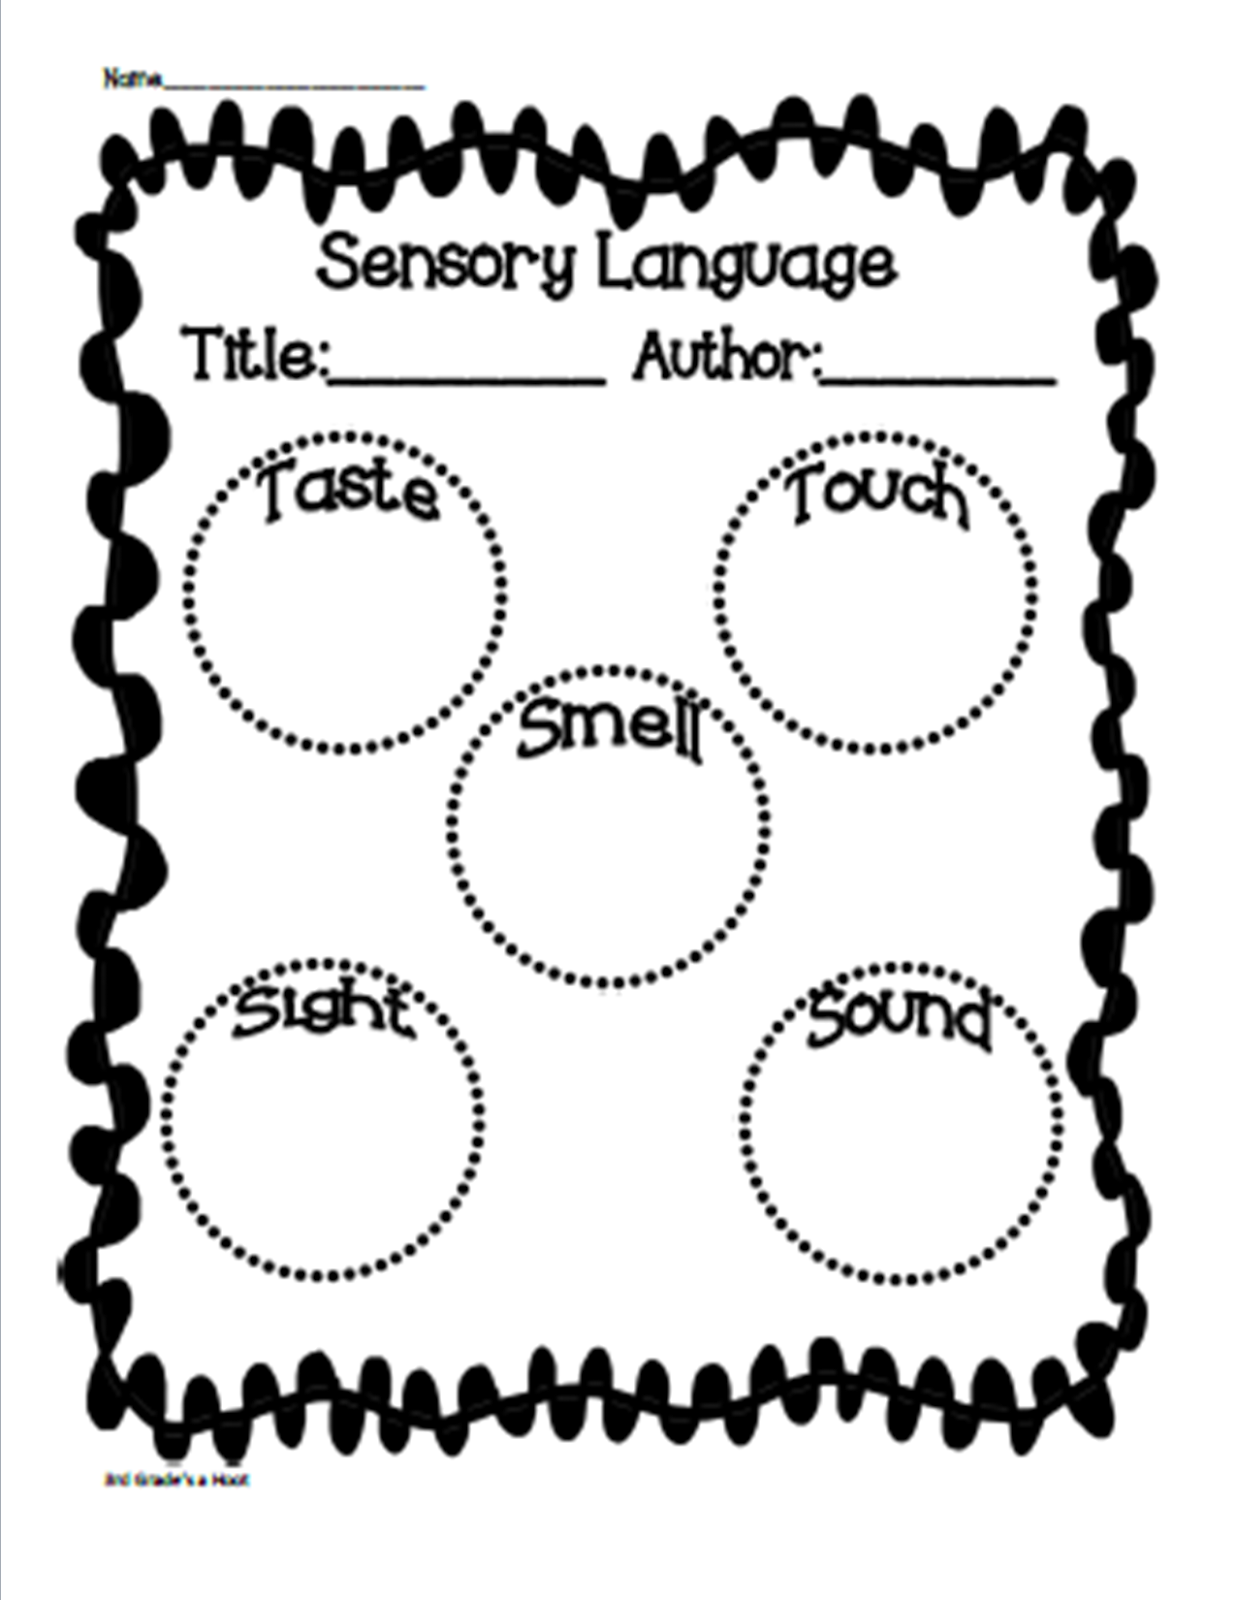 Sensory Language Freebie-3rd Grade's a Hoot   Graphic organizers [ 1600 x 1236 Pixel ]